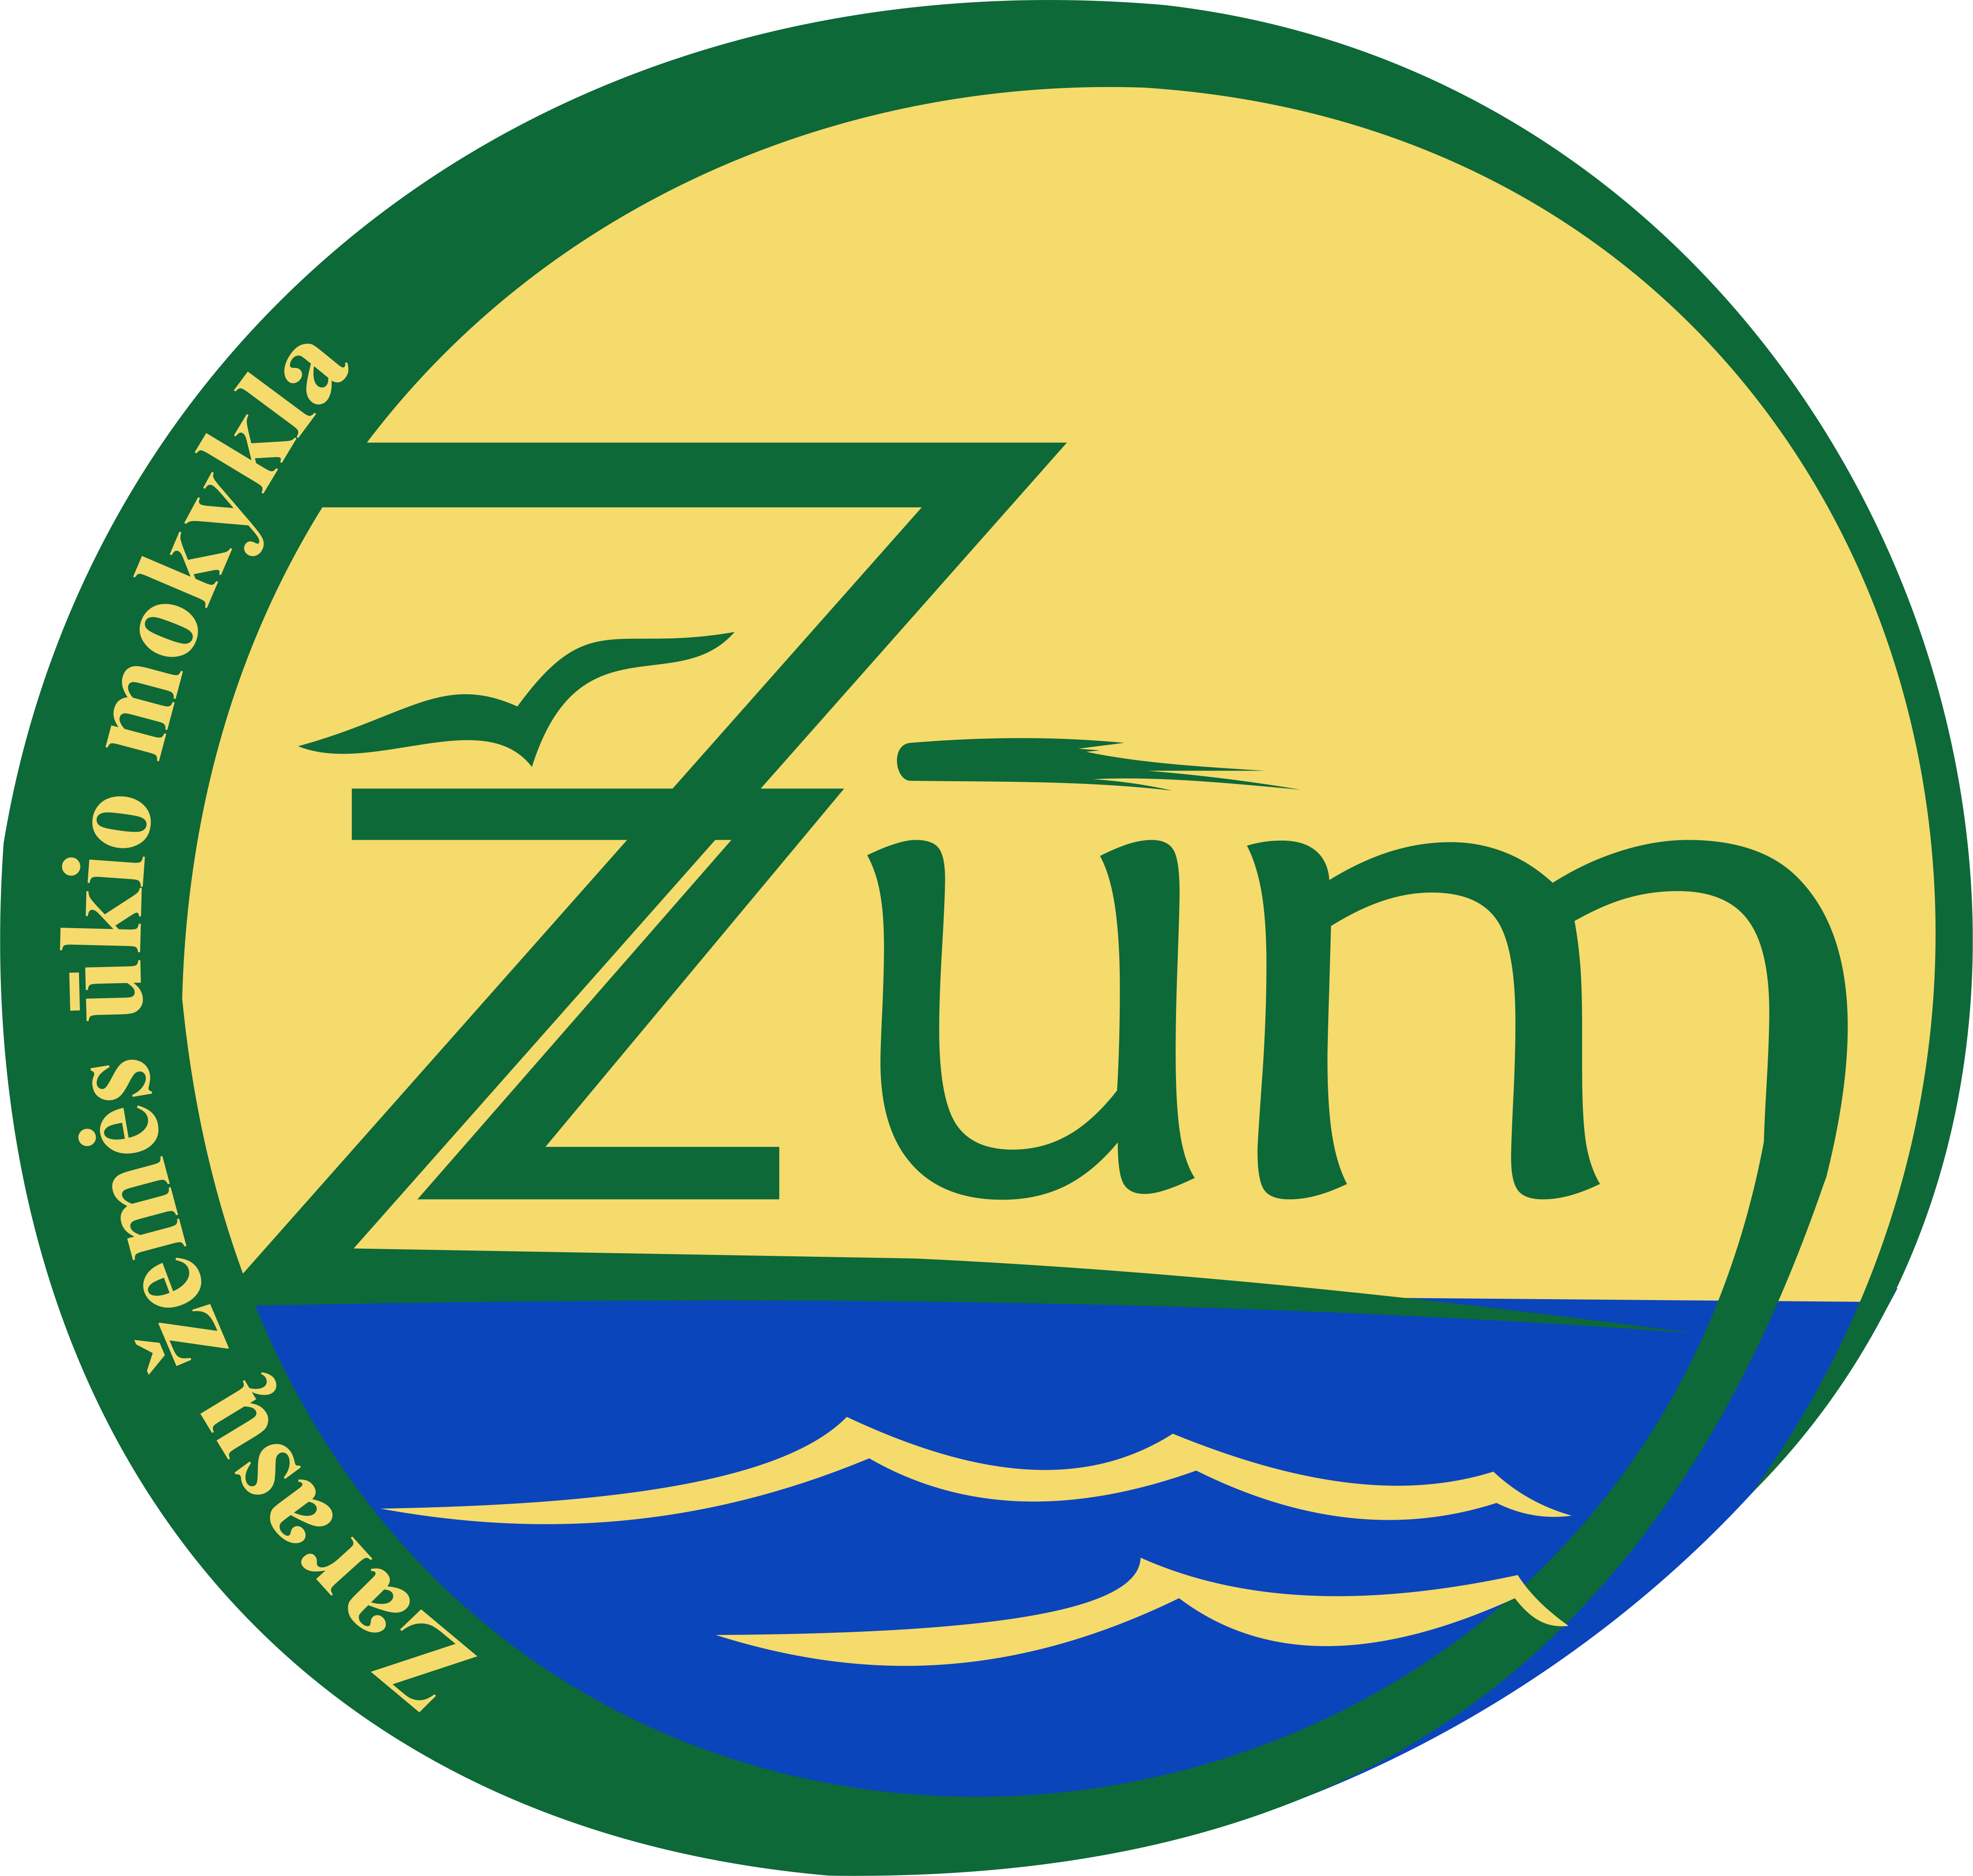 Zarasų žemės ūkio mokykla